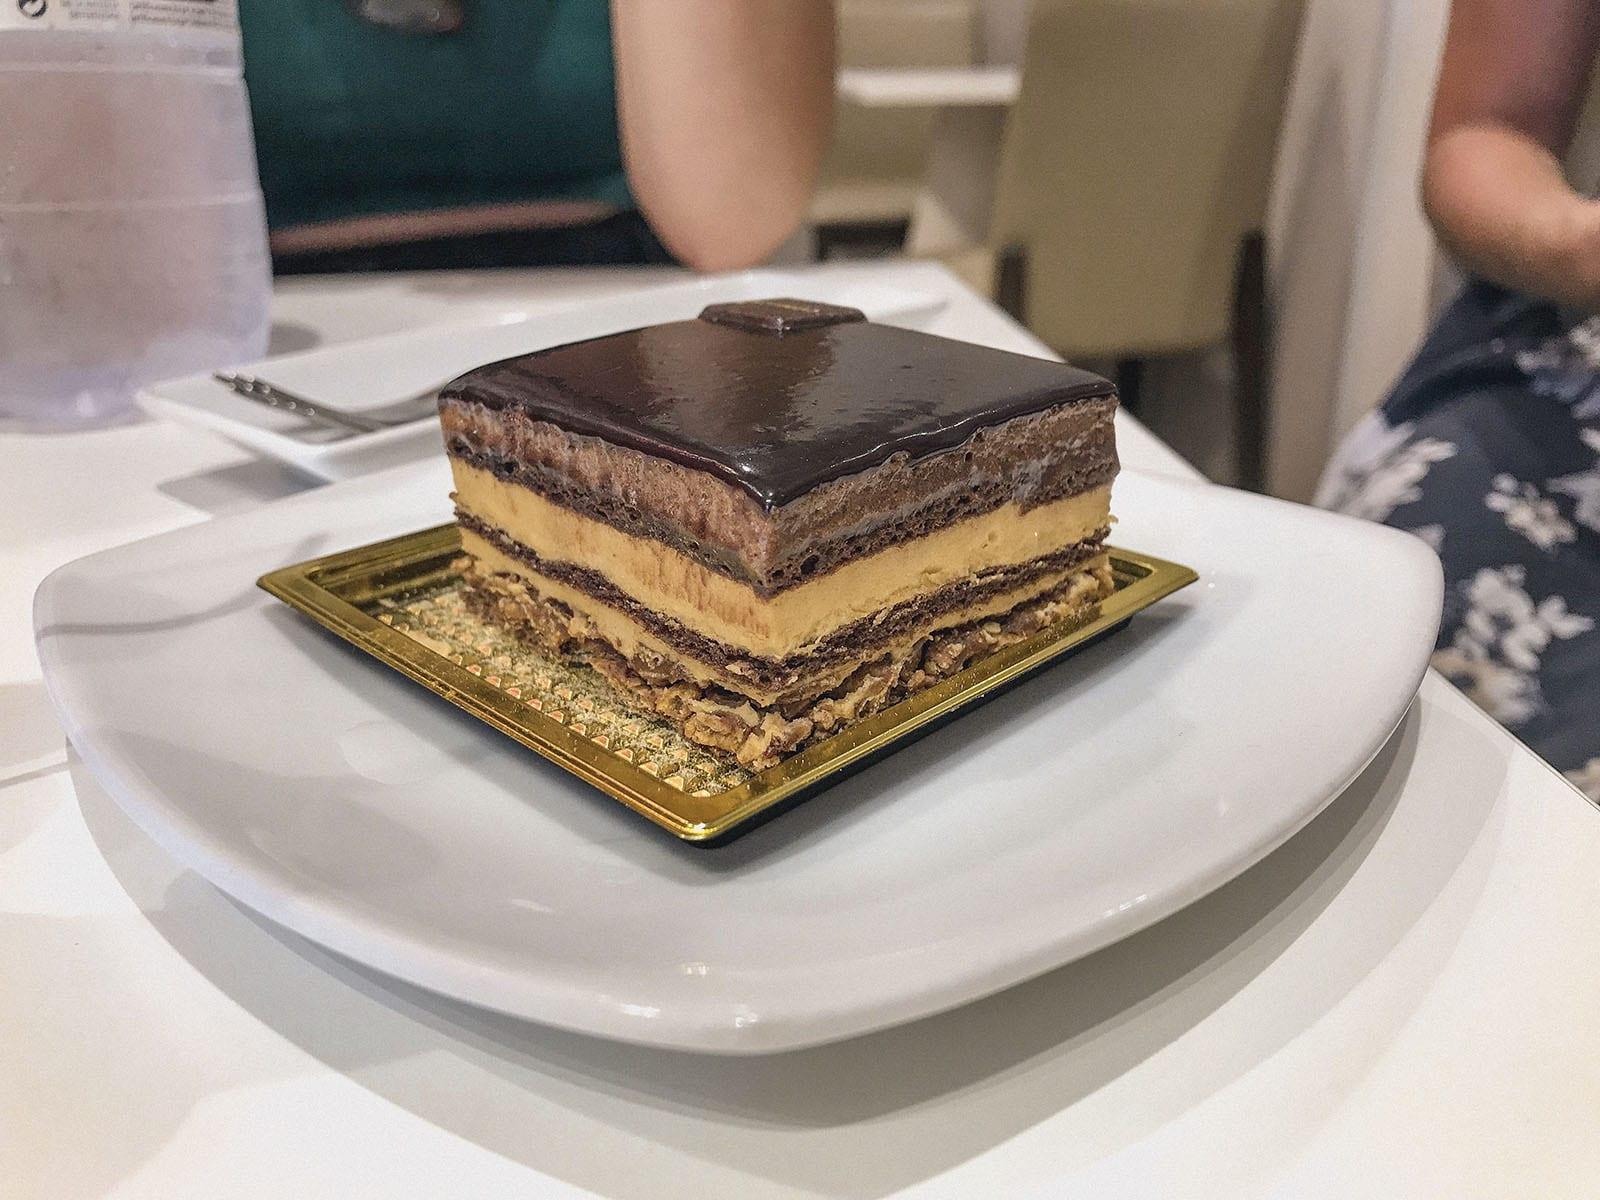 Palermo Torta Setteveli